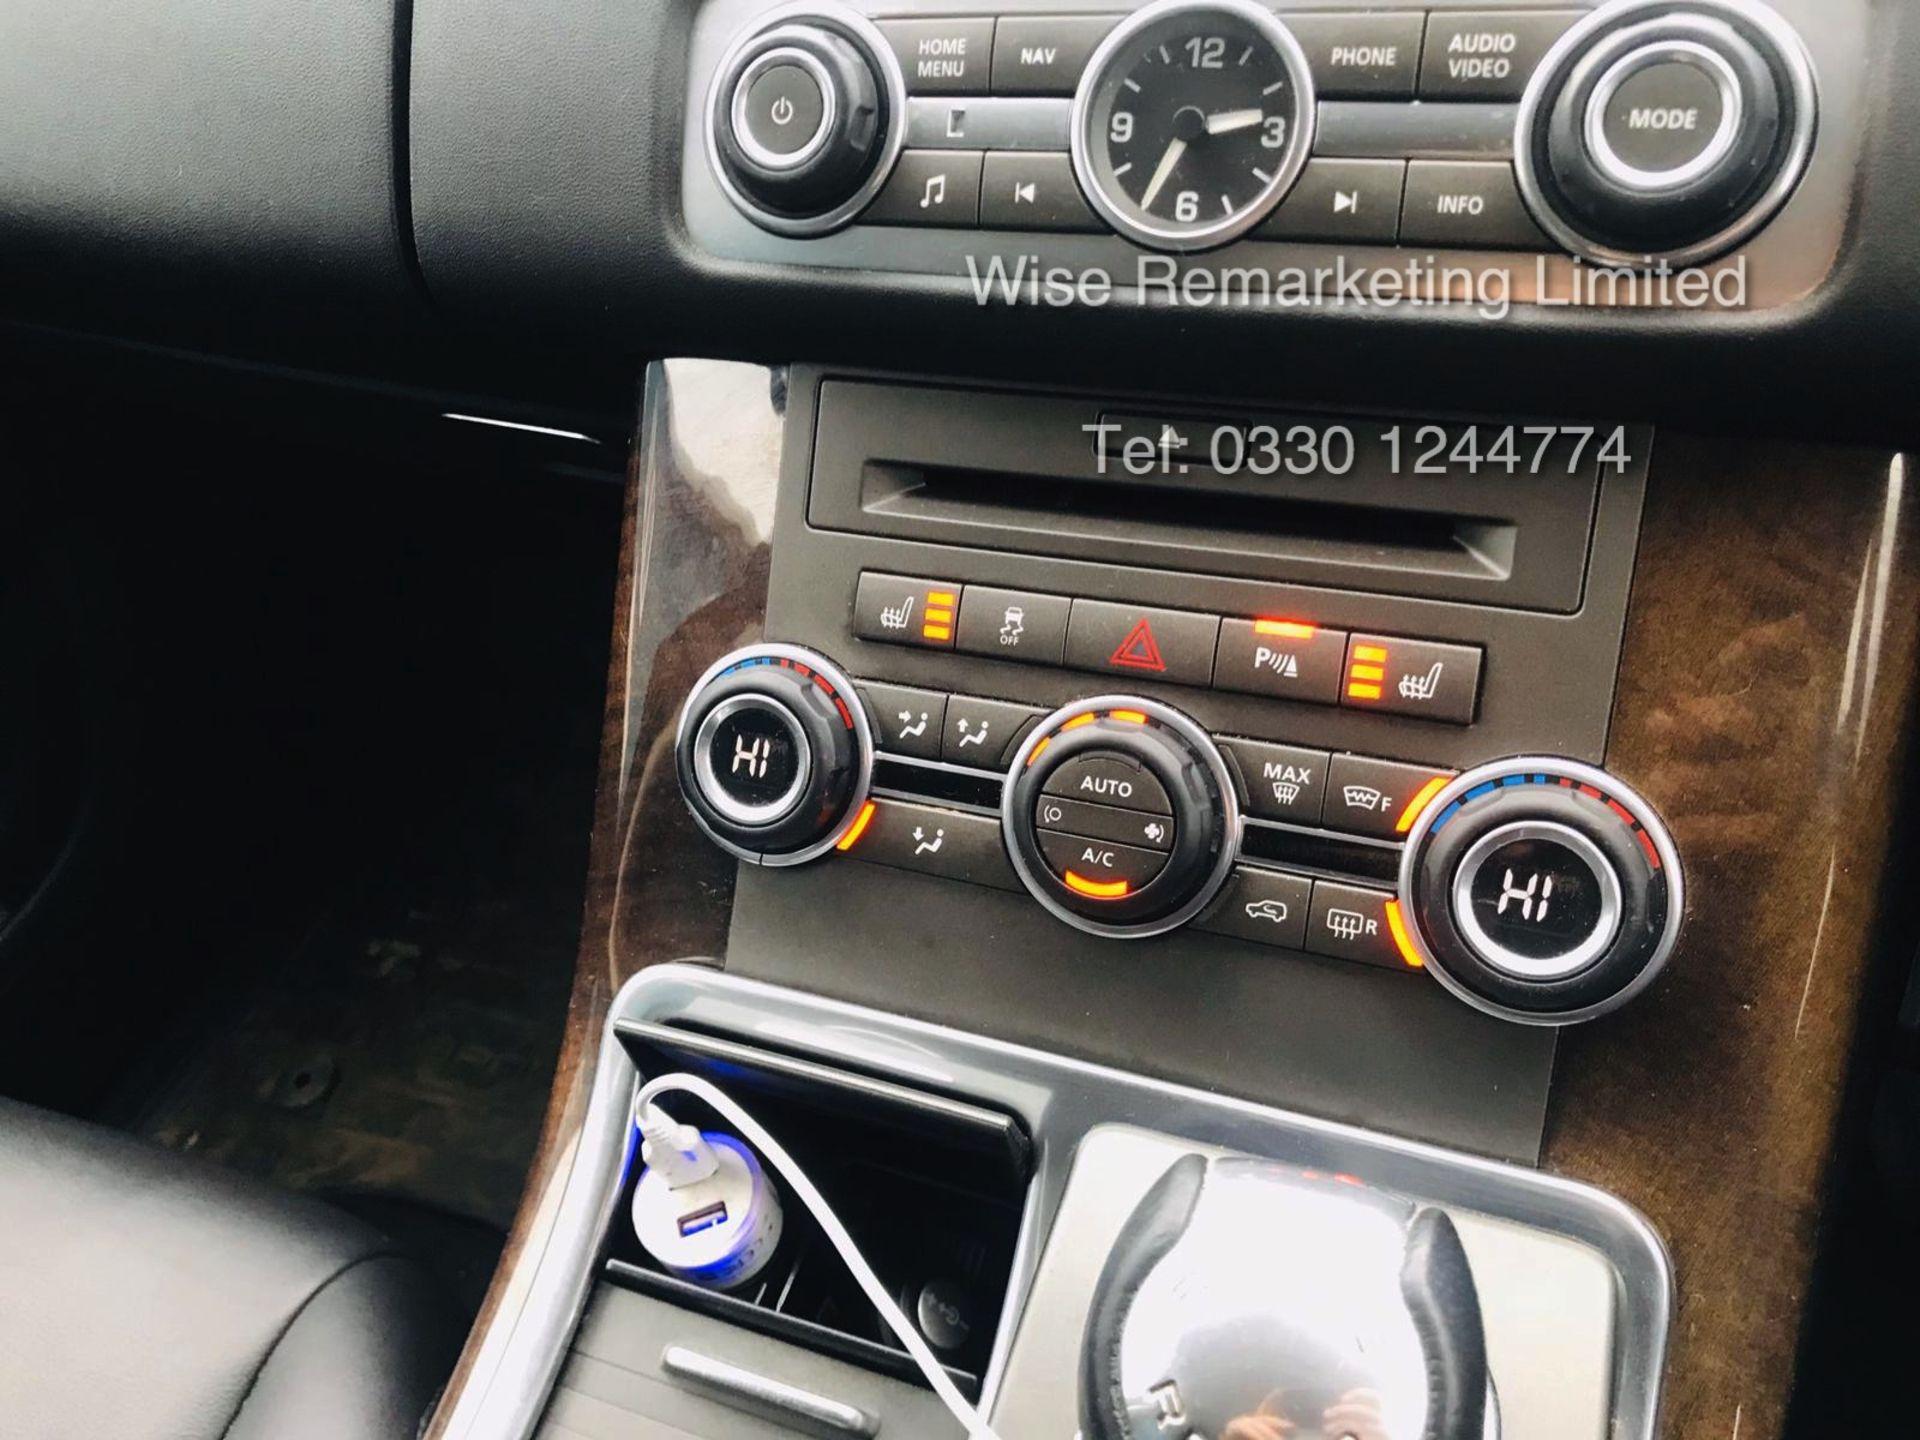 Lot 13 - Range Rover Sport SE 3.0 TDV6 Automatic - 2011 11 Reg - 1 Keeper From New - Service History